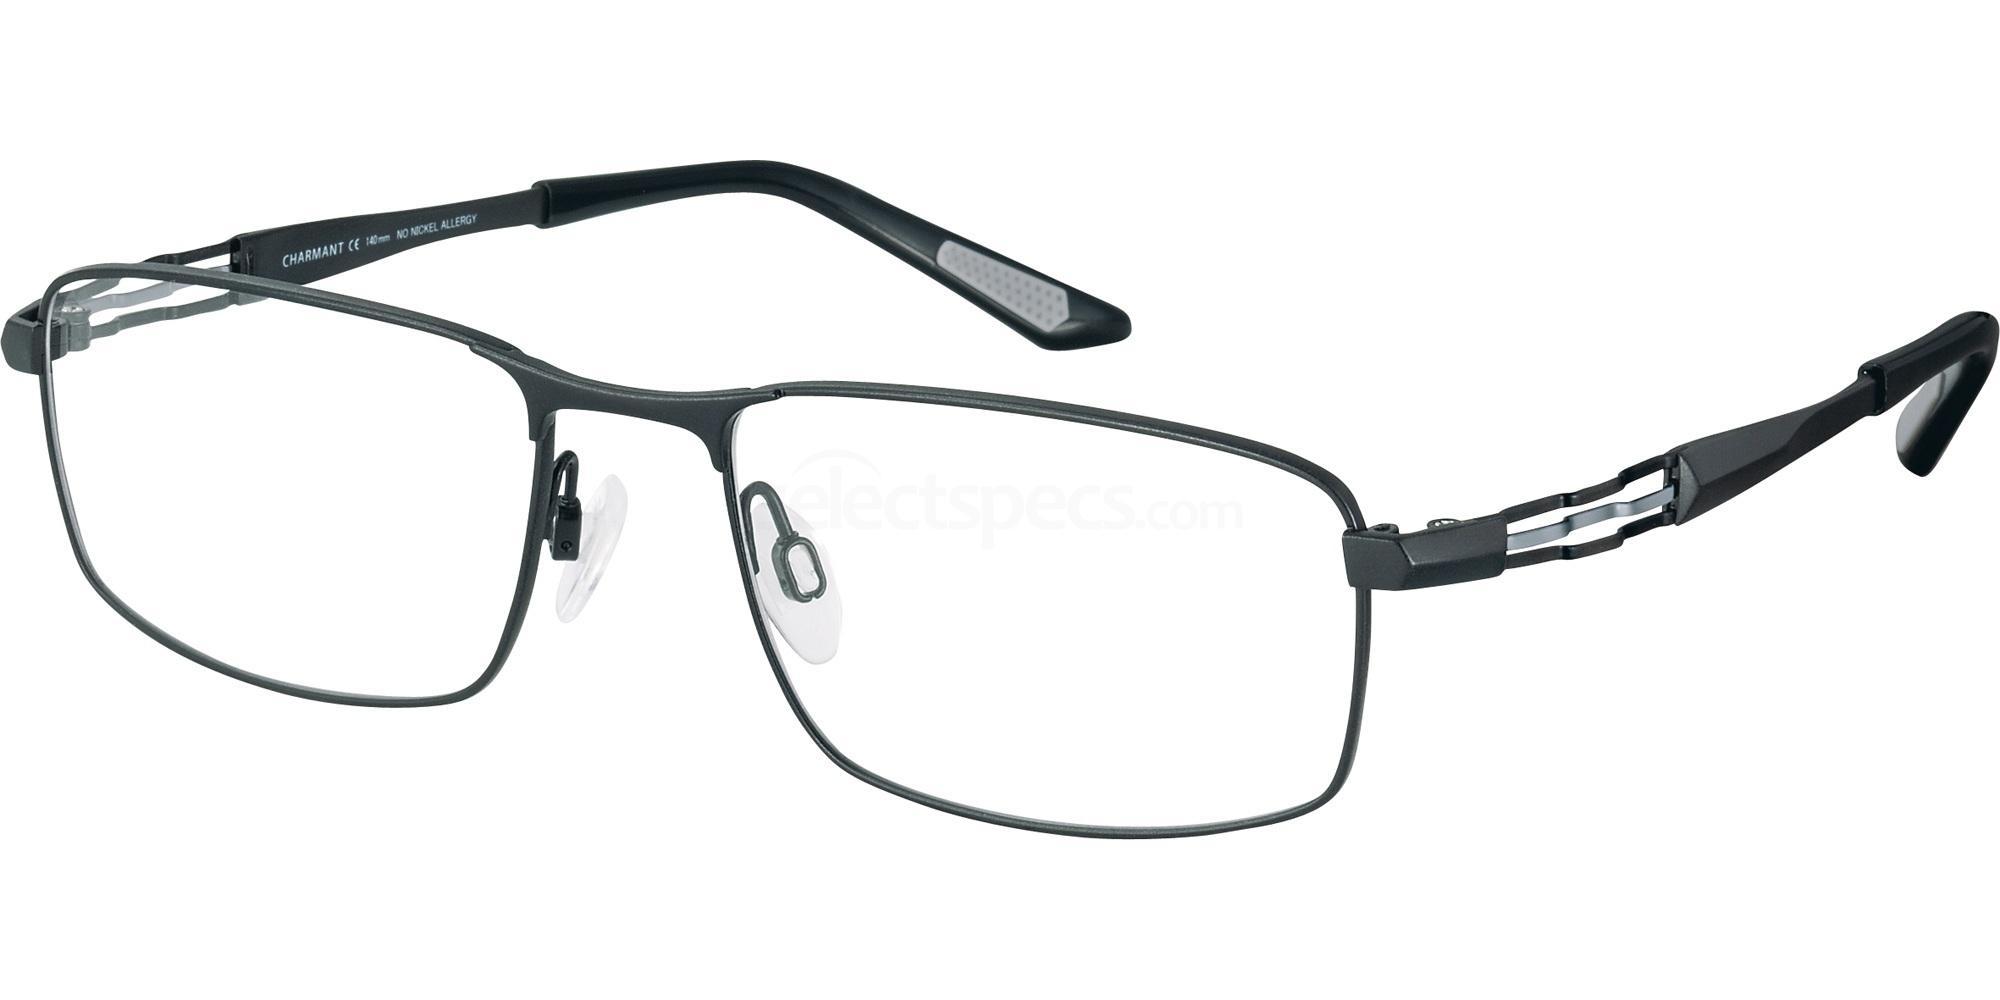 BK CH12301 Glasses, Charmant Titanium Perfection